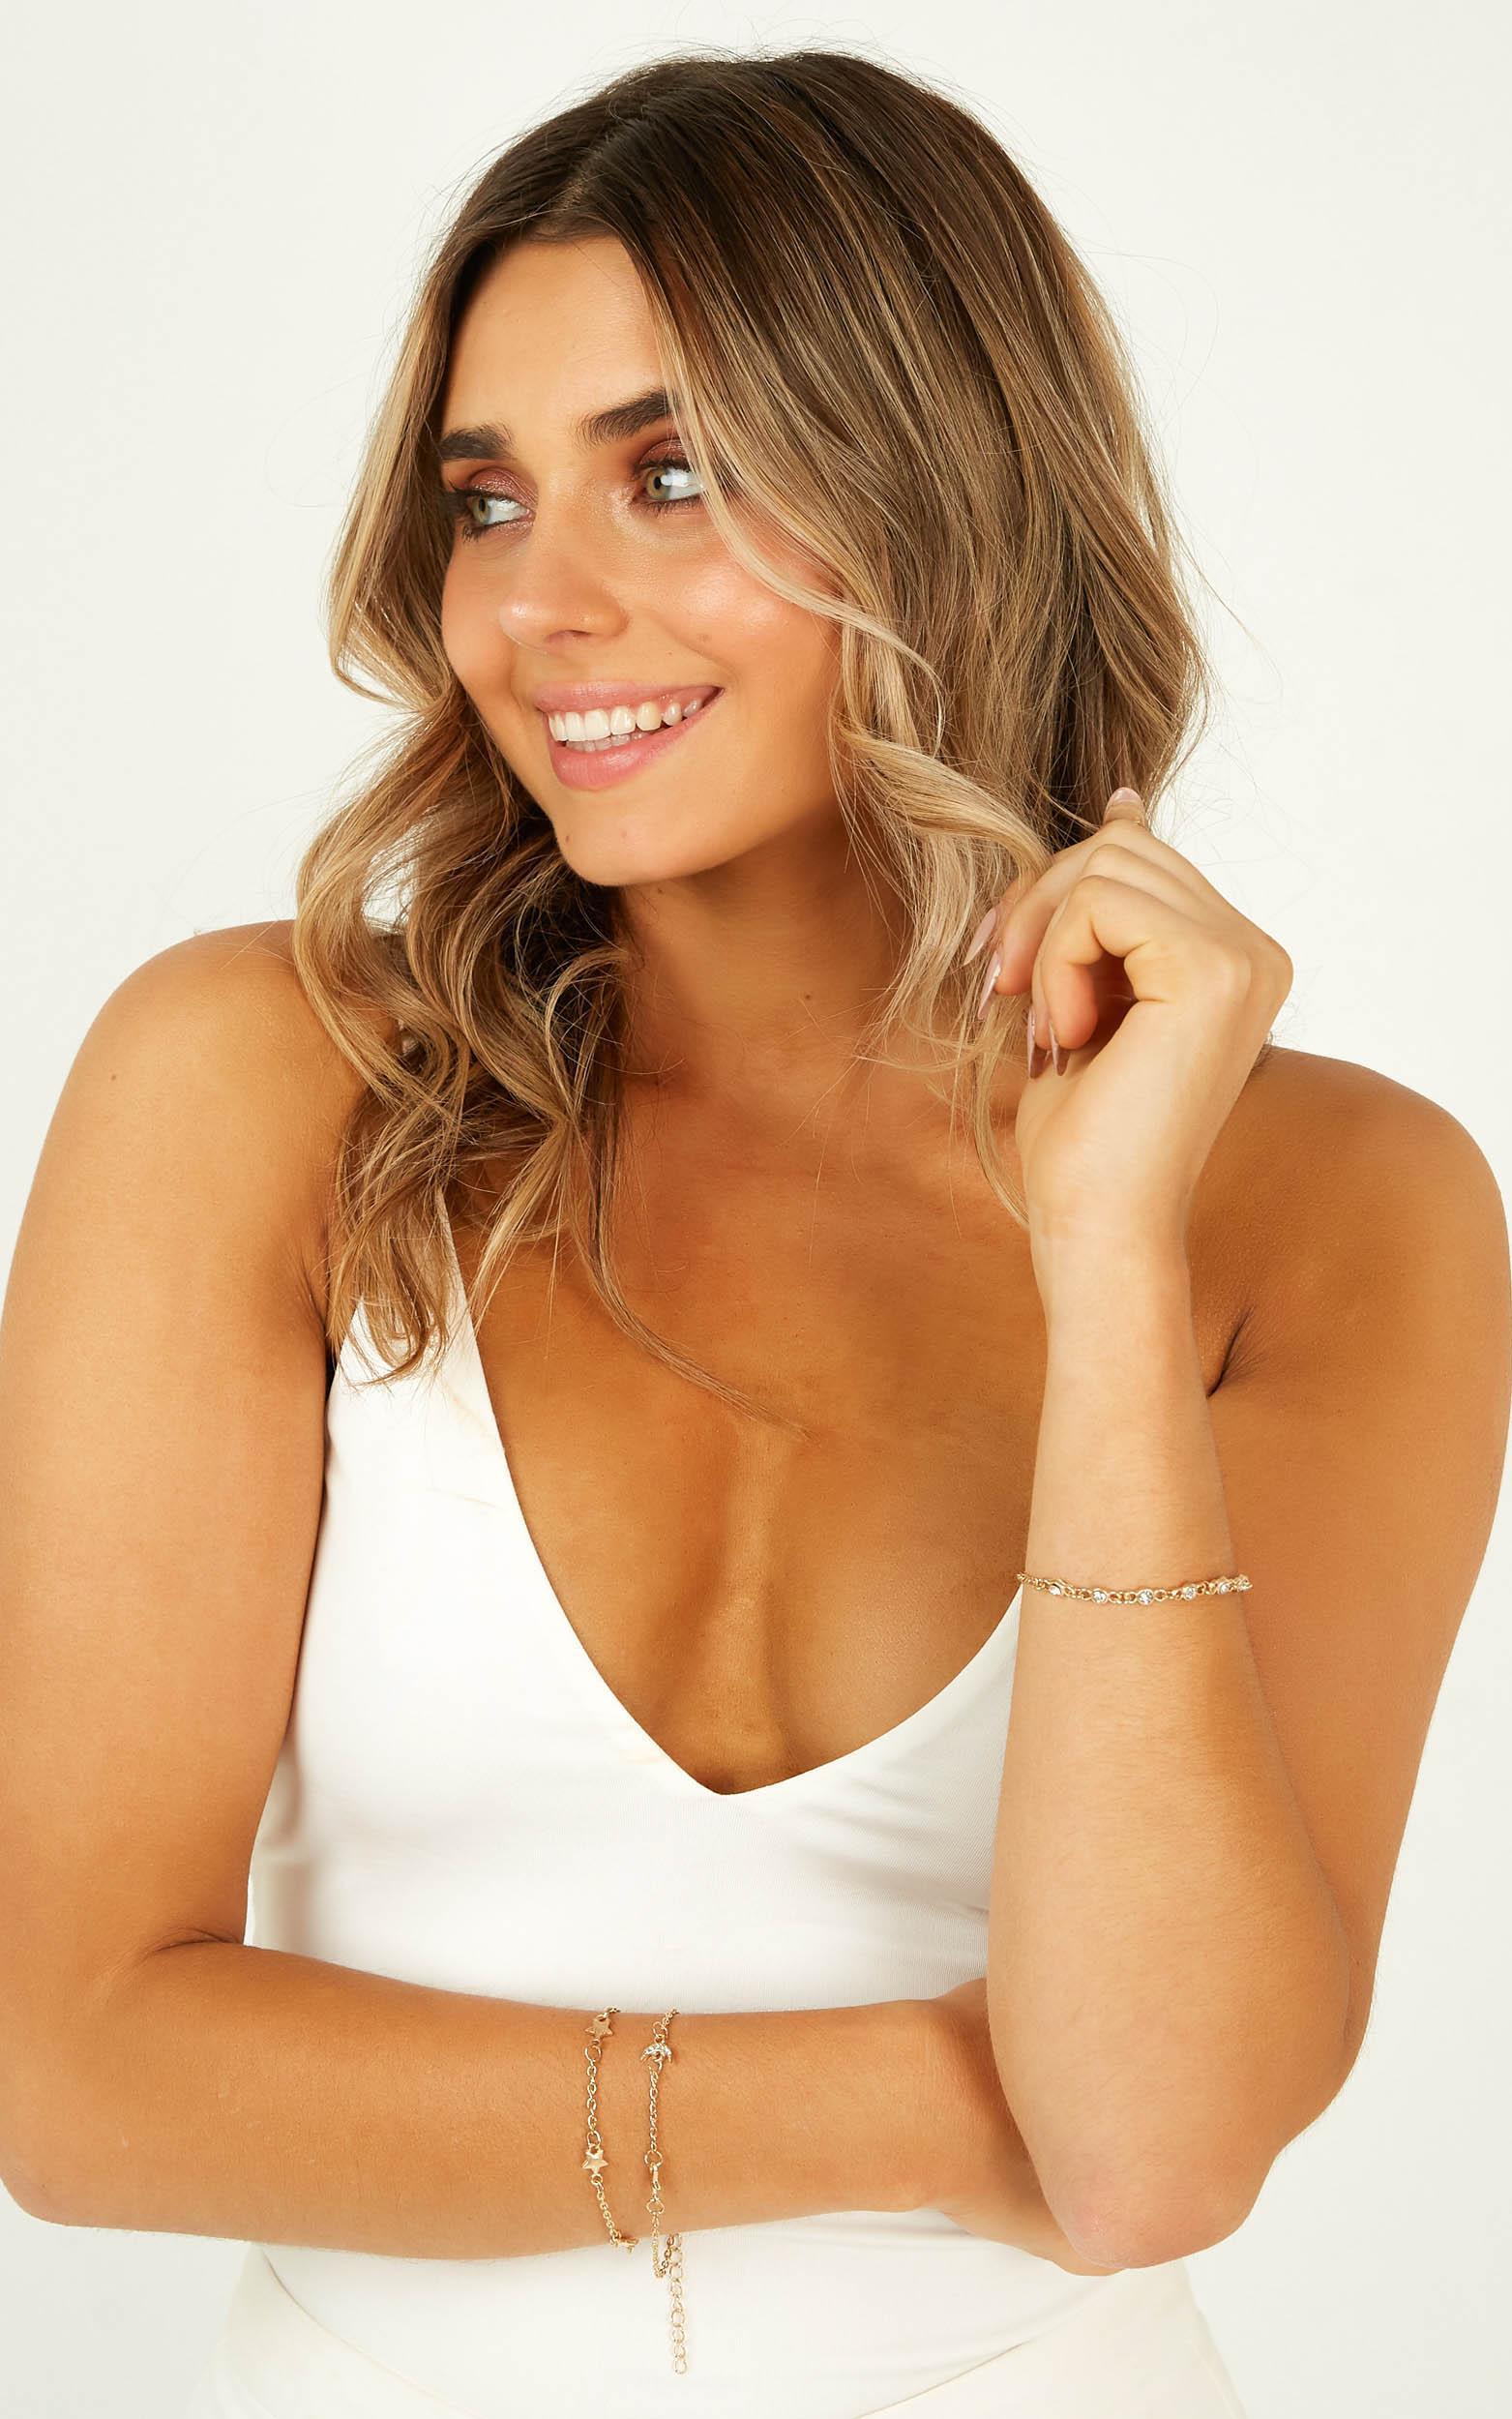 Want You Close Bracelet Set In Gold, , hi-res image number null